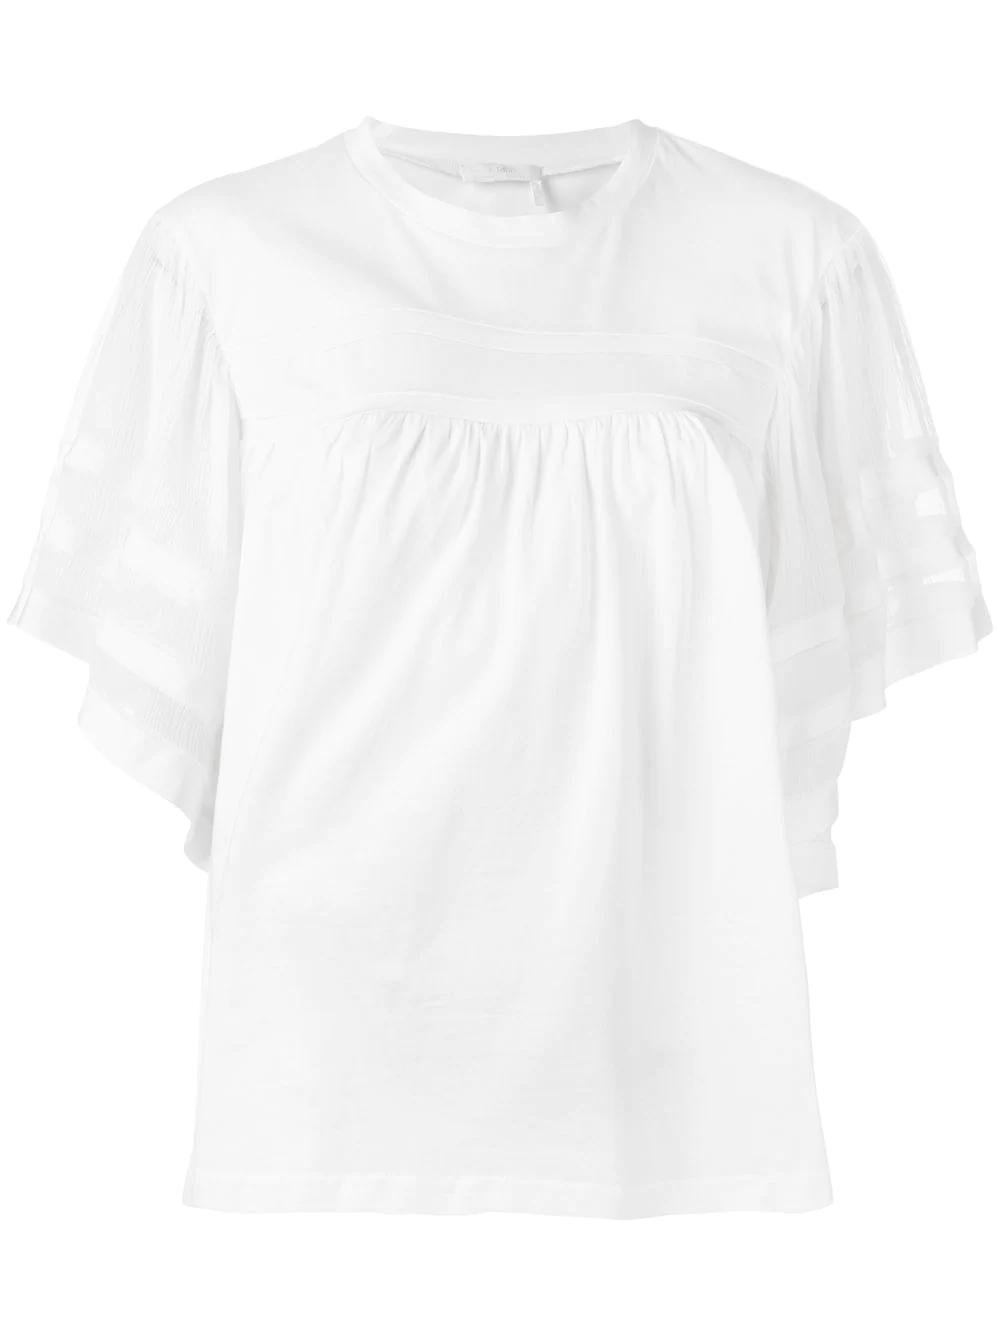 Chloé | блузка с полупрозрачными рукавами | Clouty